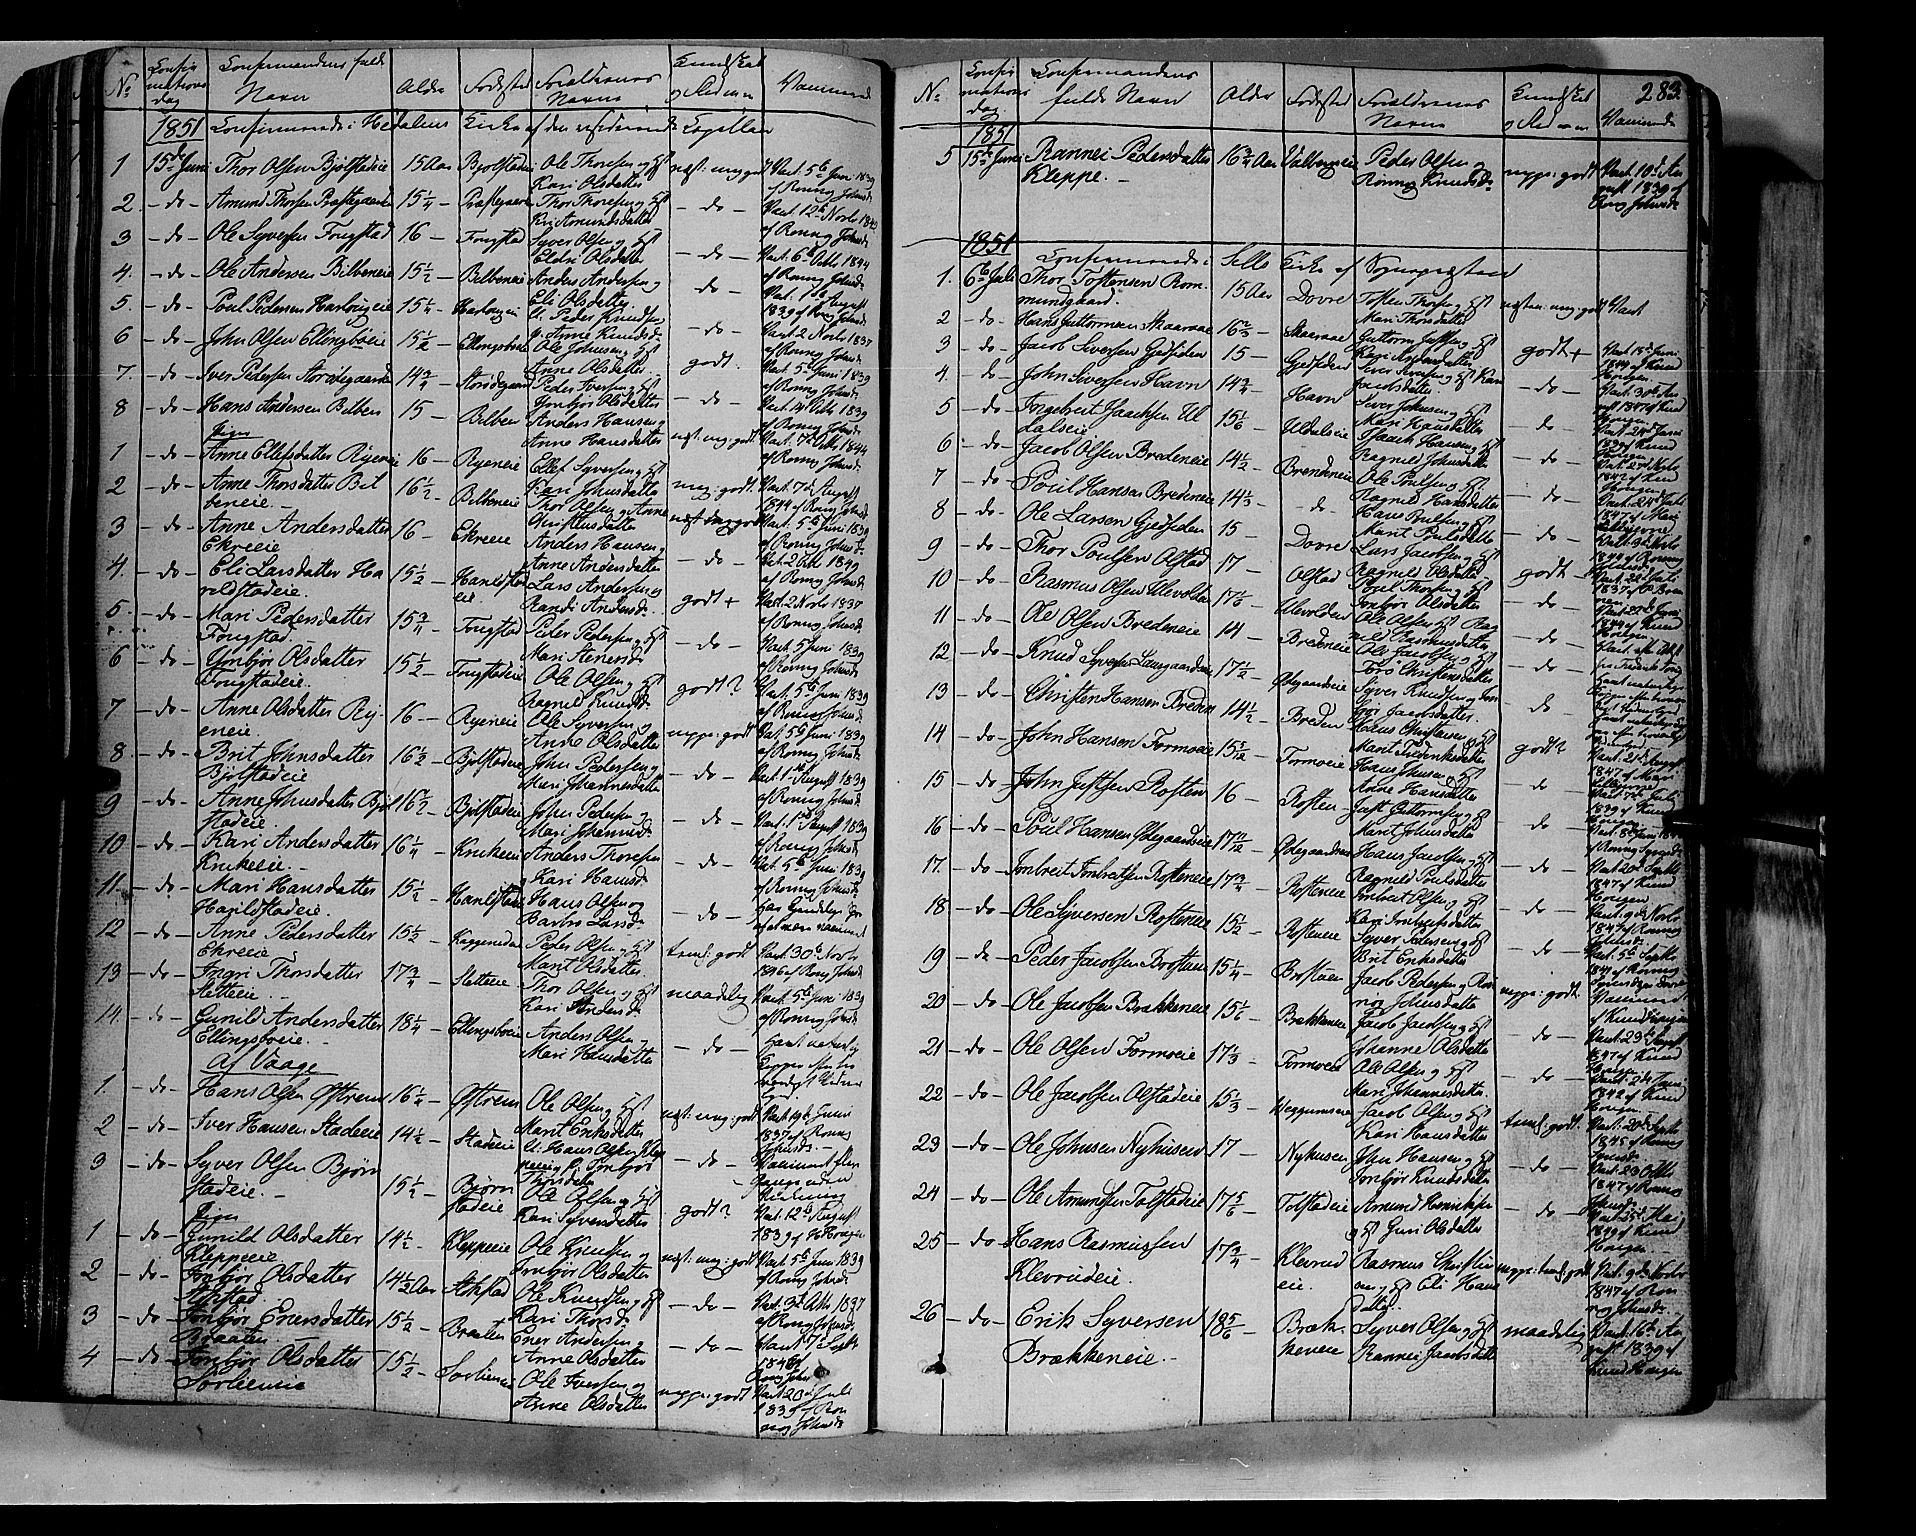 SAH, Vågå prestekontor, Ministerialbok nr. 5 /1, 1842-1856, s. 283